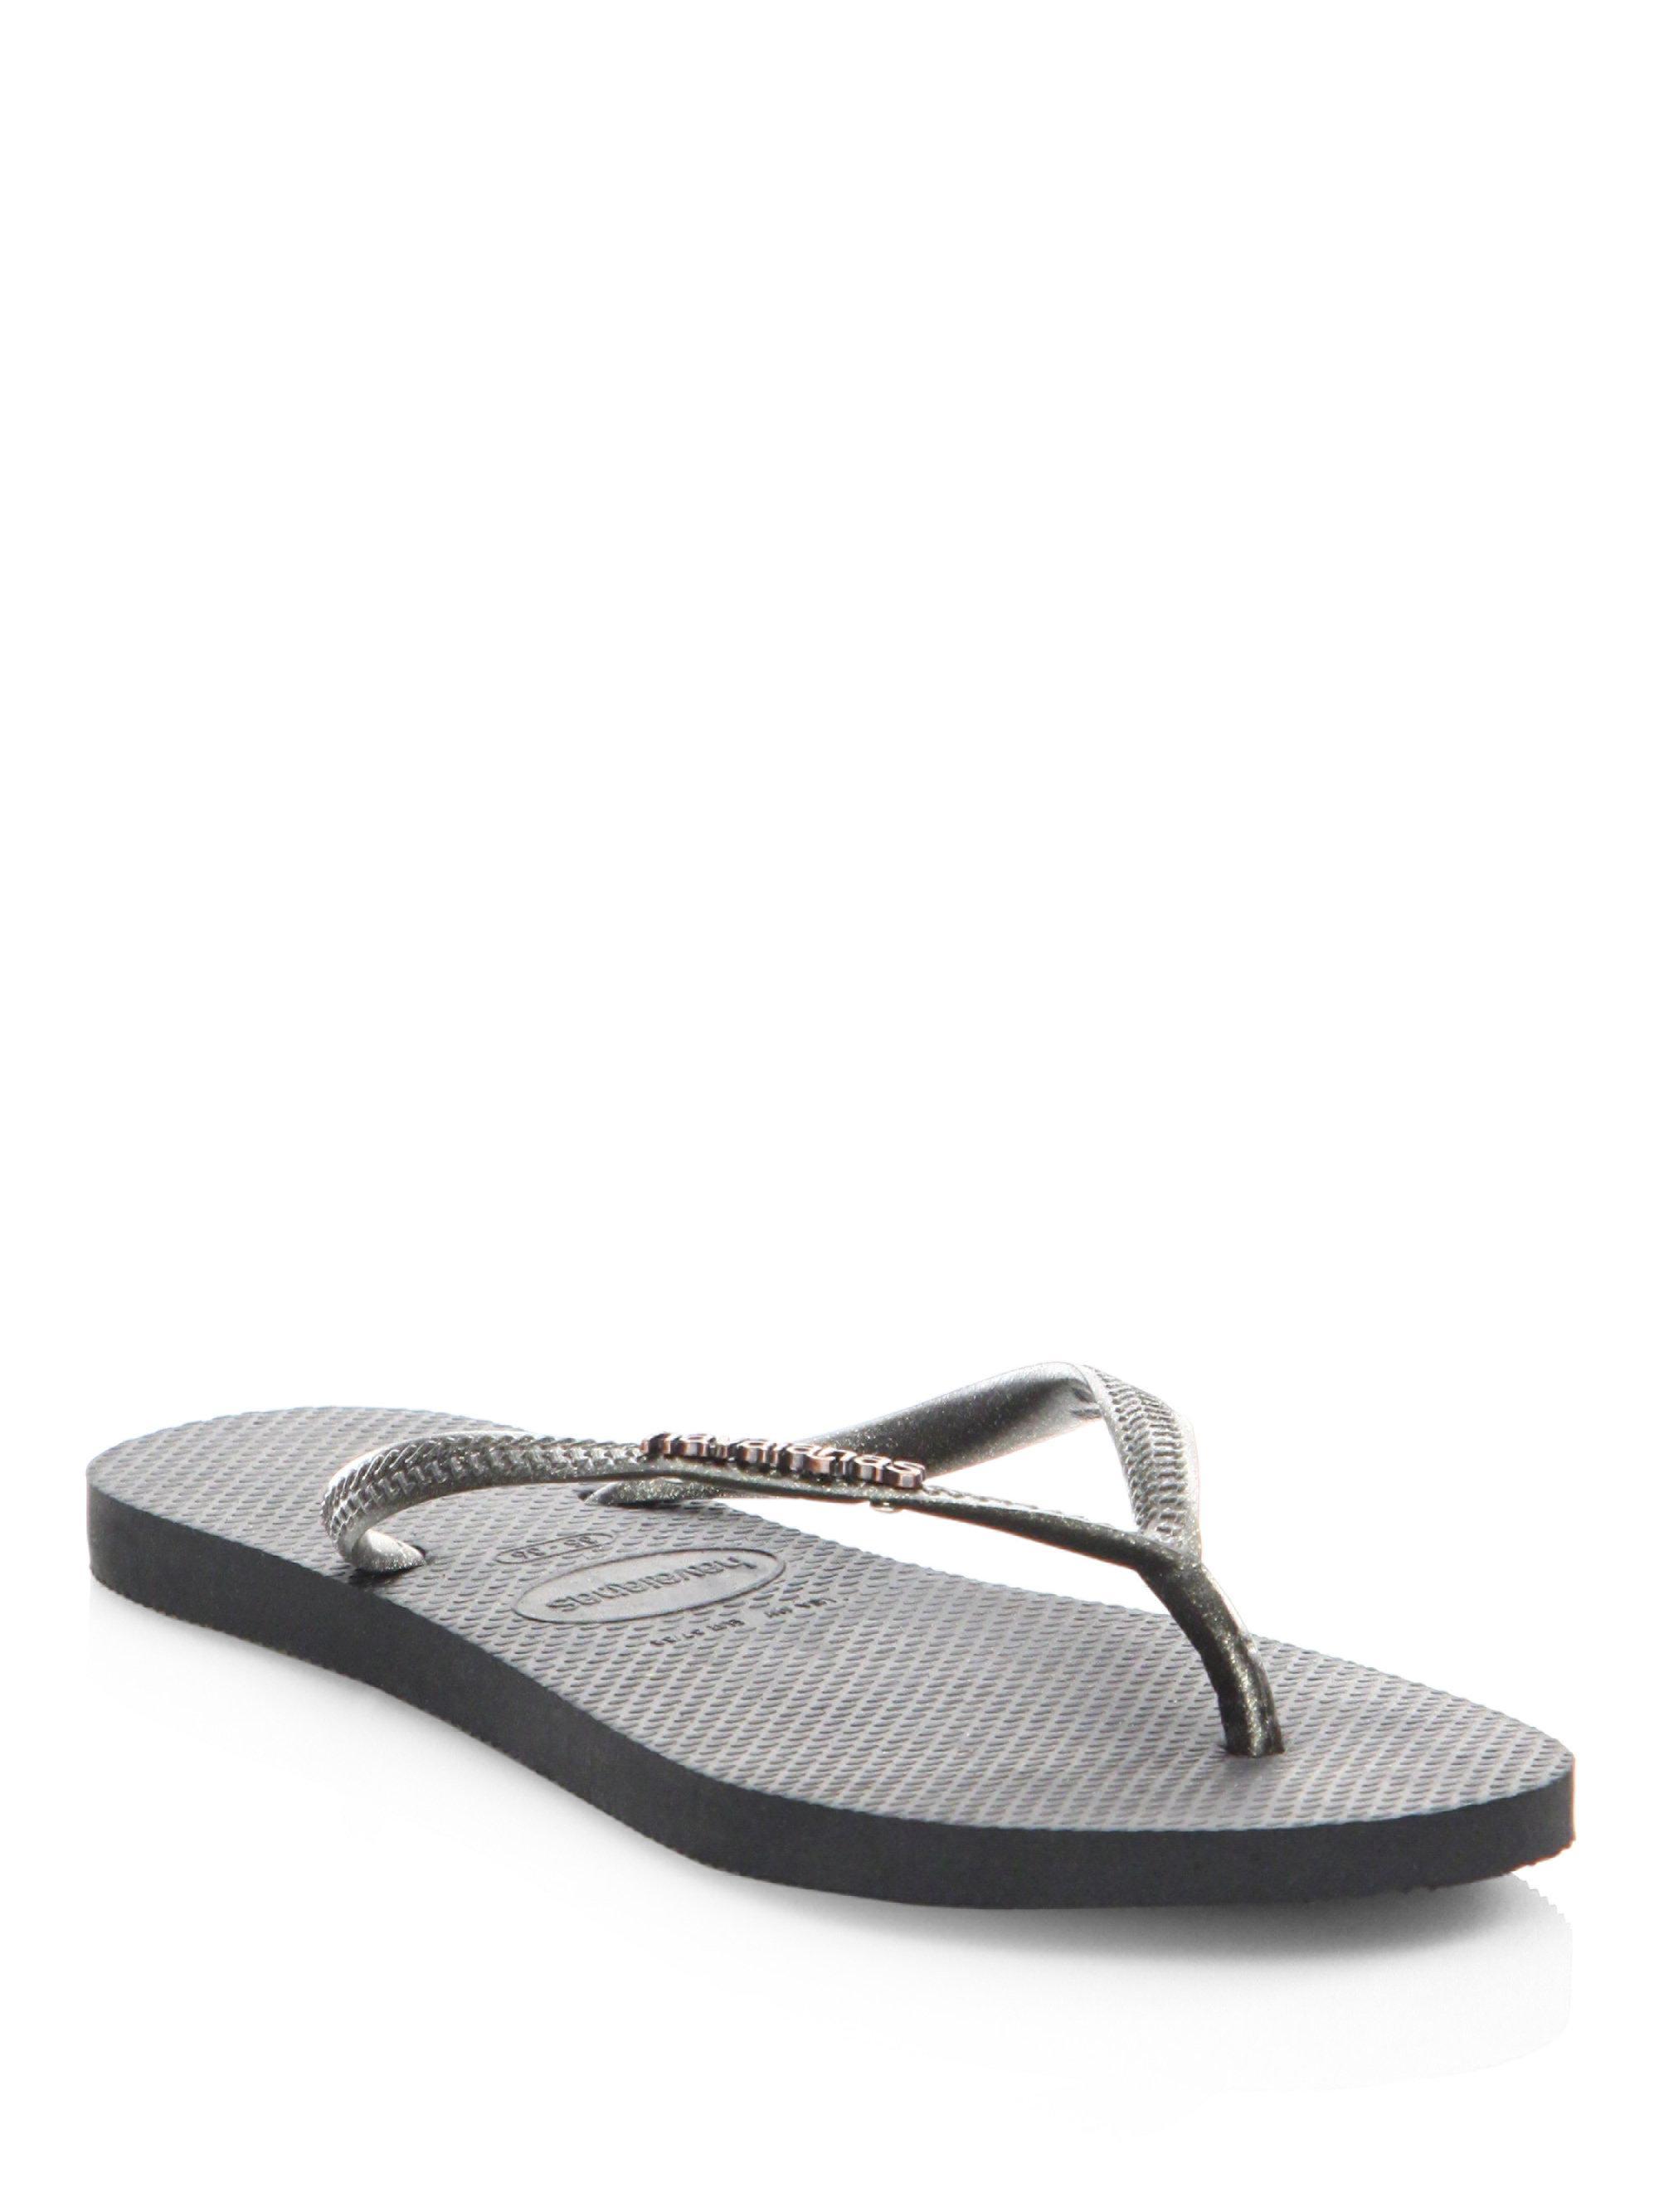 Havaianas Textured Rubber Thong Flip-Flops DzY4I6Ipq